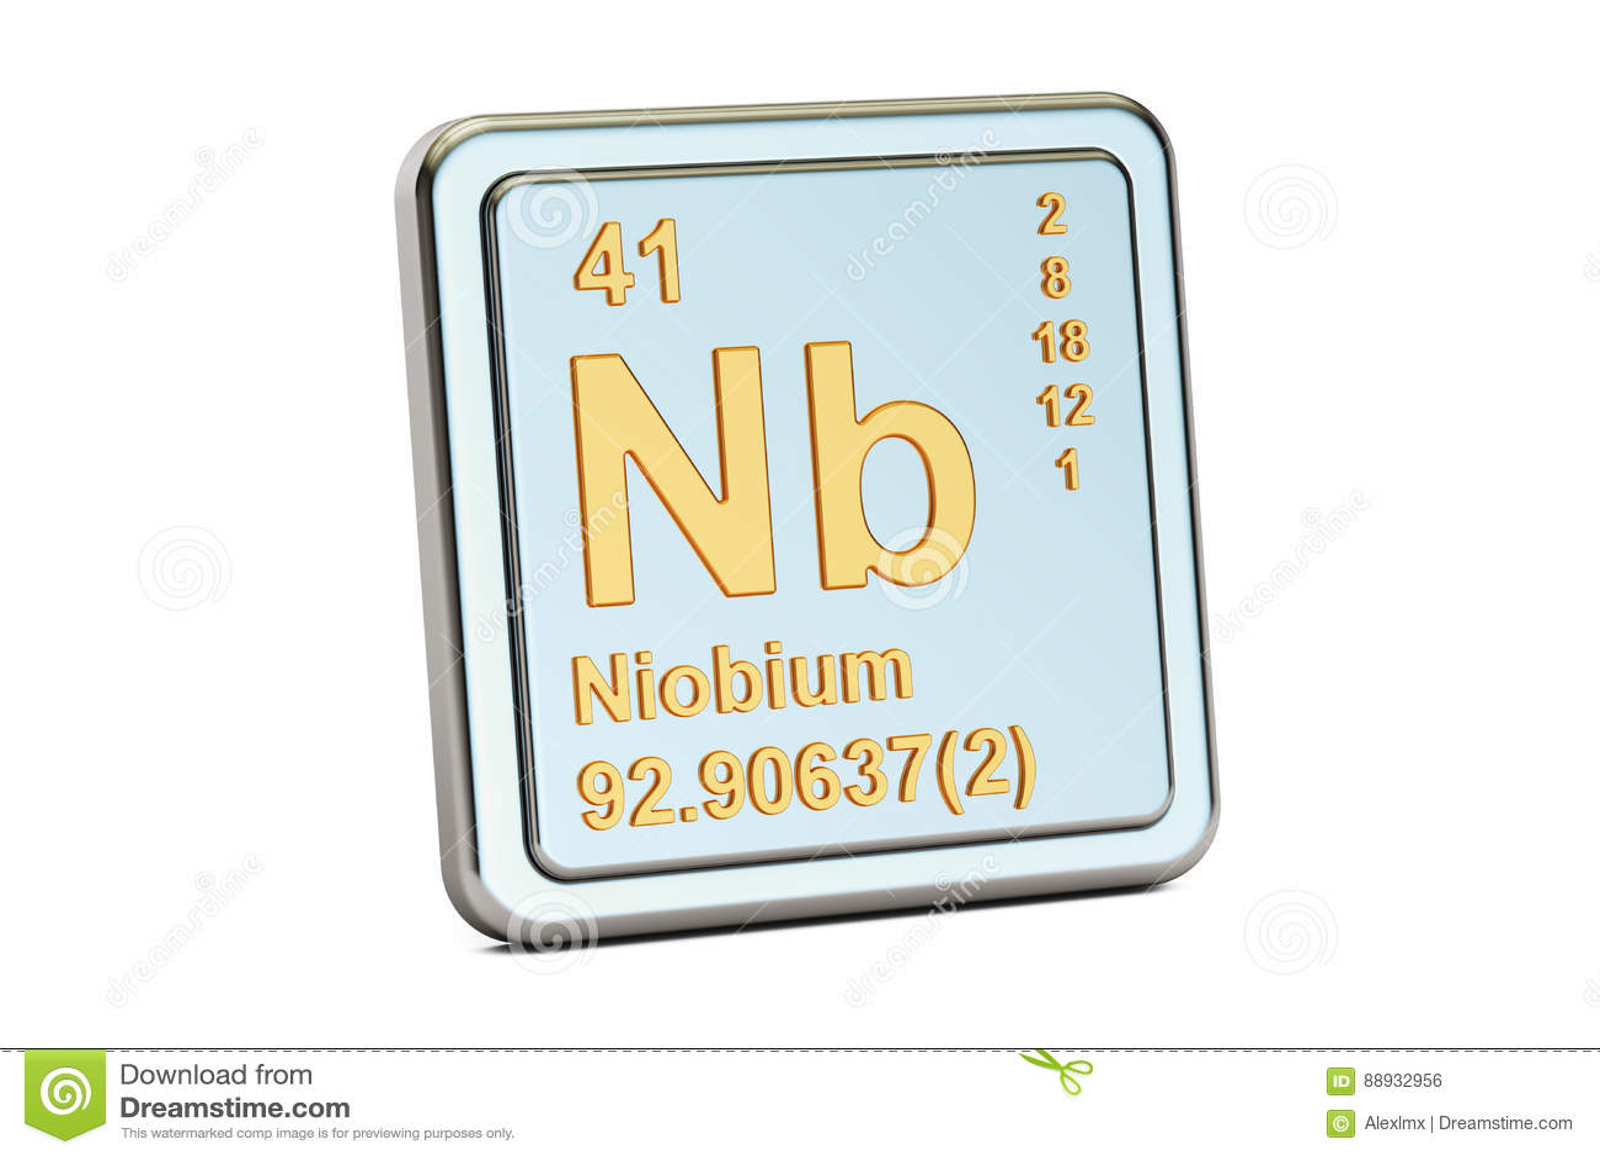 Niobium Nb Chemical Element Sign 3d Rendering Stock Photo Image